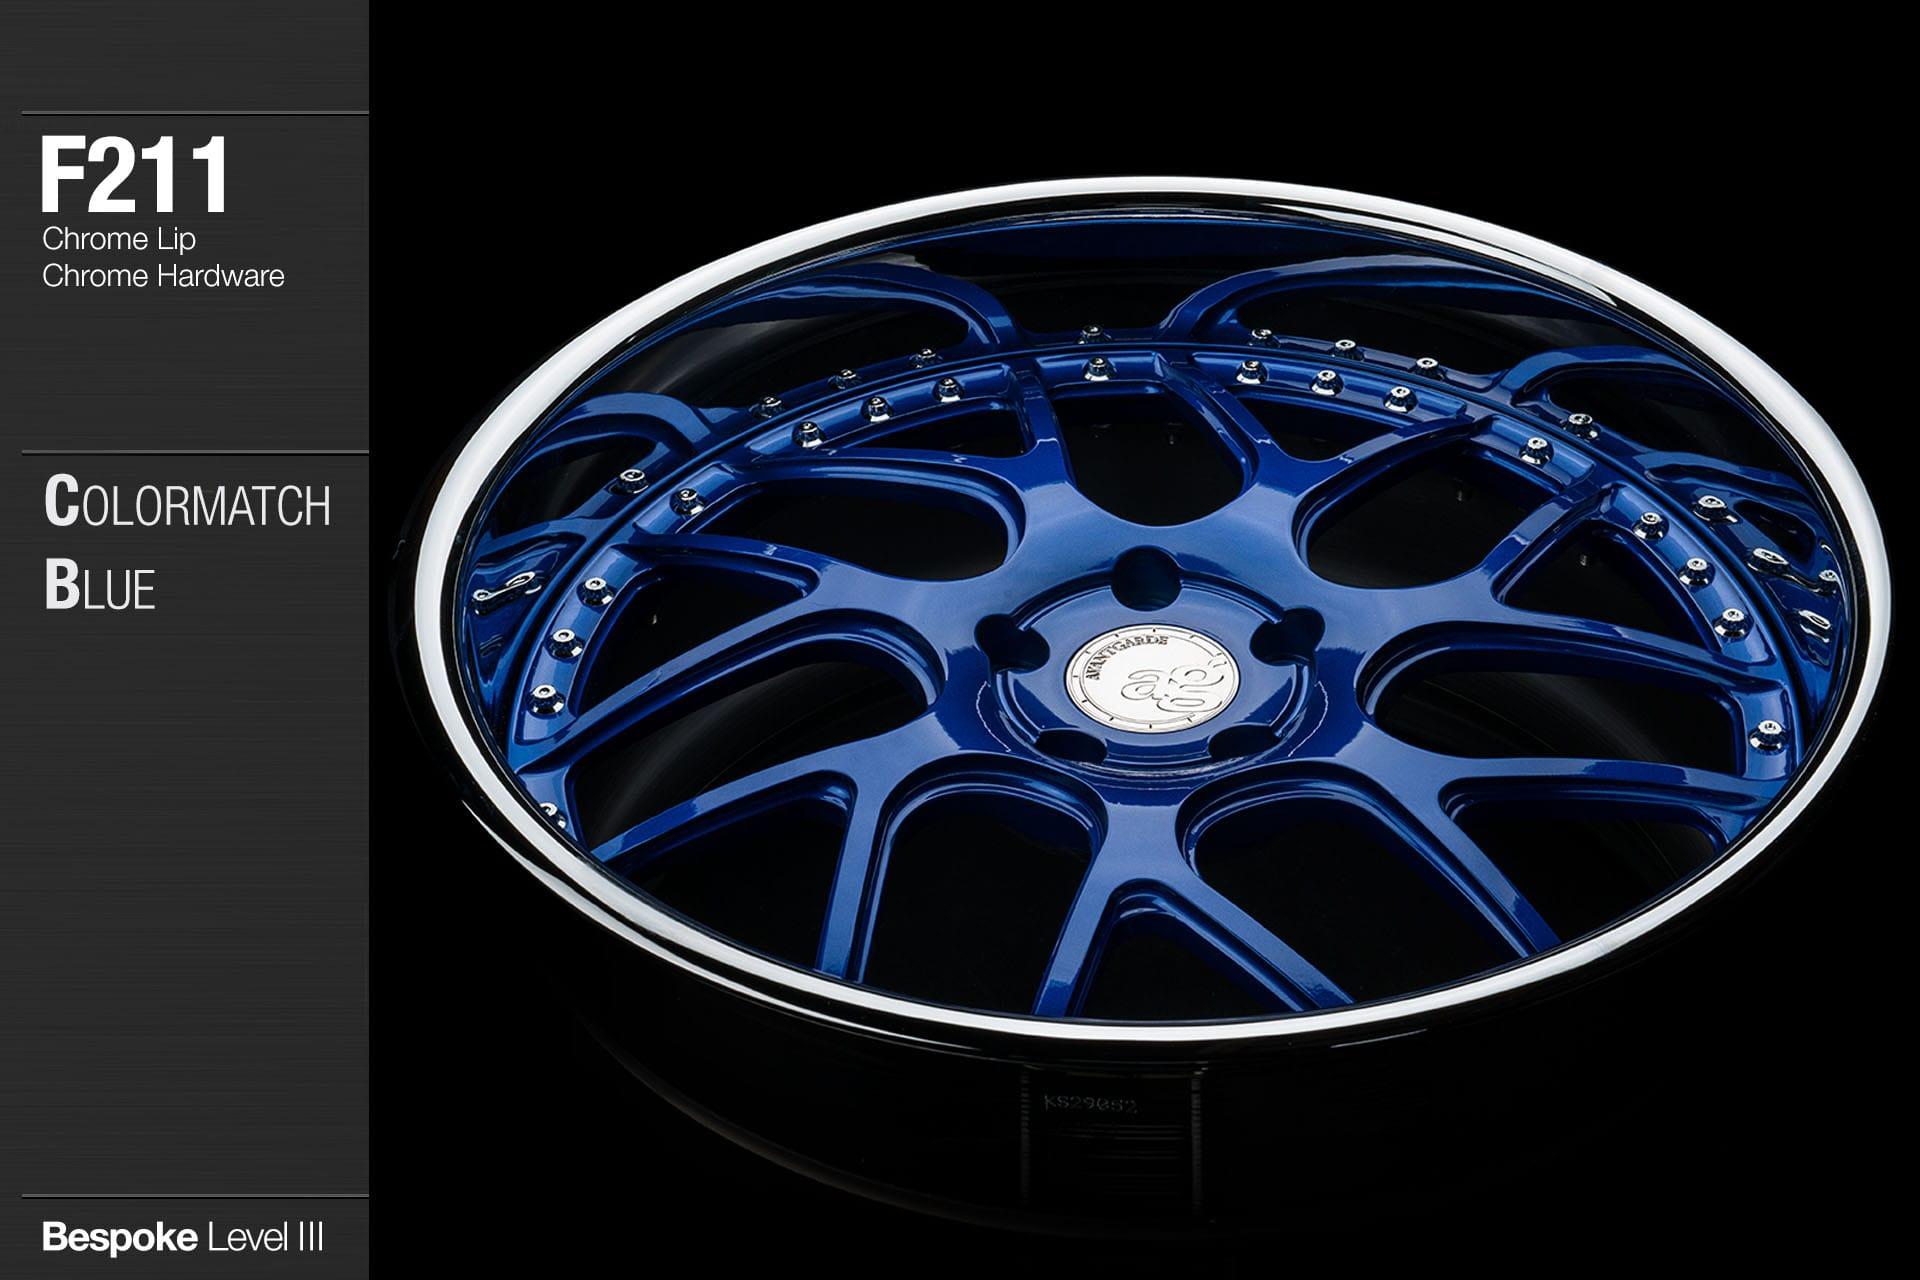 agwheels ag wheel wheels avant garde f211 ultrasonic blue chrome lip hardware forged wheels forge 3piece 3 piece 19inch 20inch